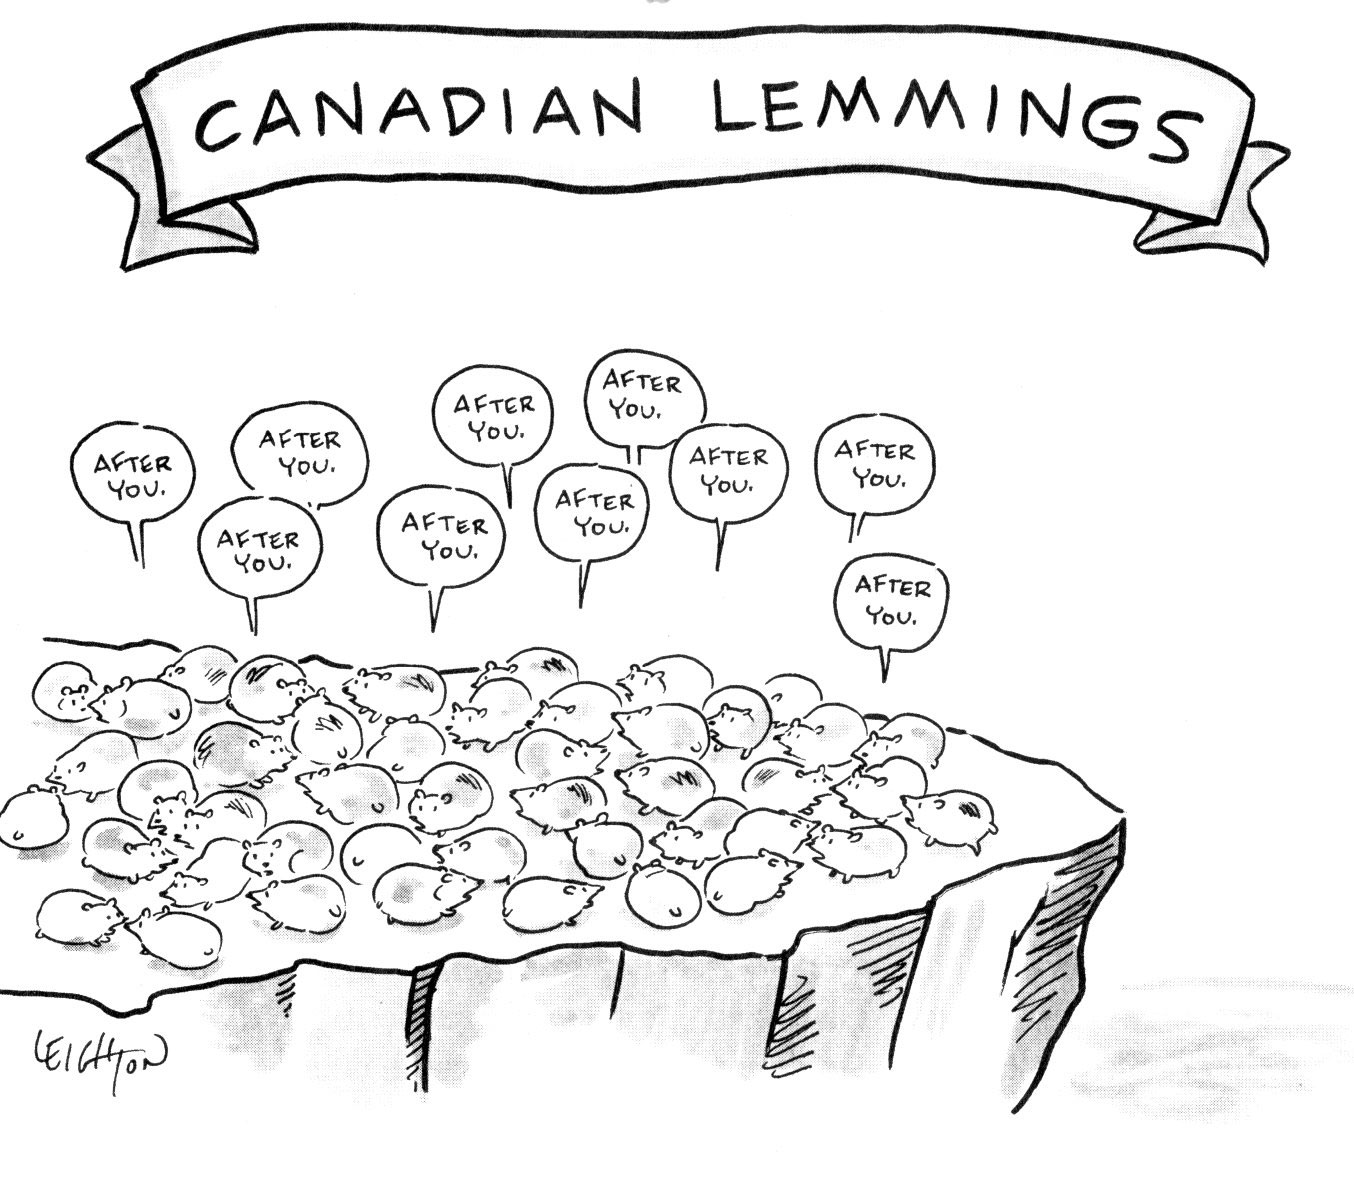 Lemmings song names in essays